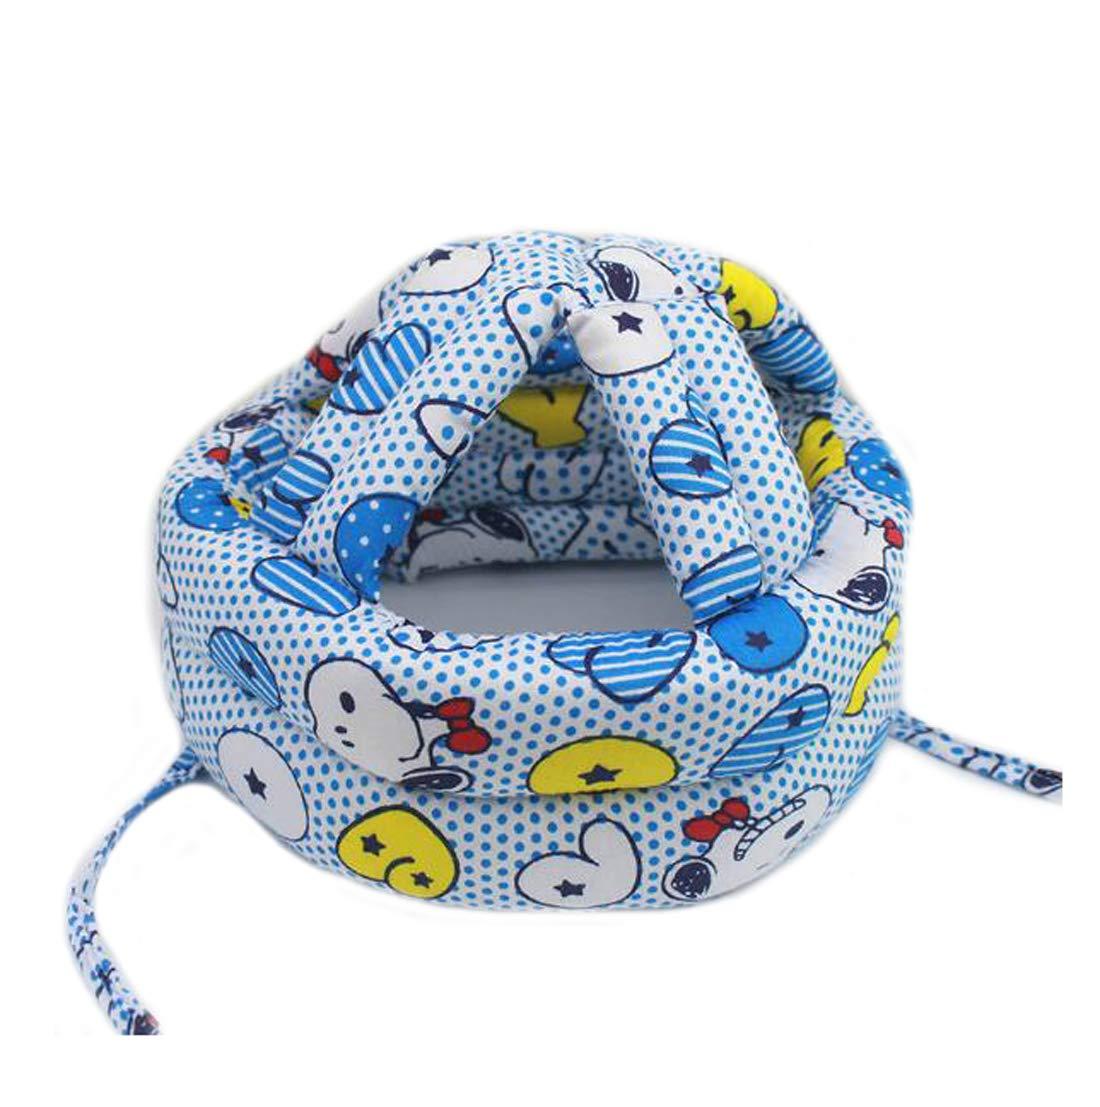 Ewanda store Toddler Infant Baby No Bumps Head Helmet Safety Helmet Children Headguard Head Cushion Bumper Bonnet,M,Blue Dog